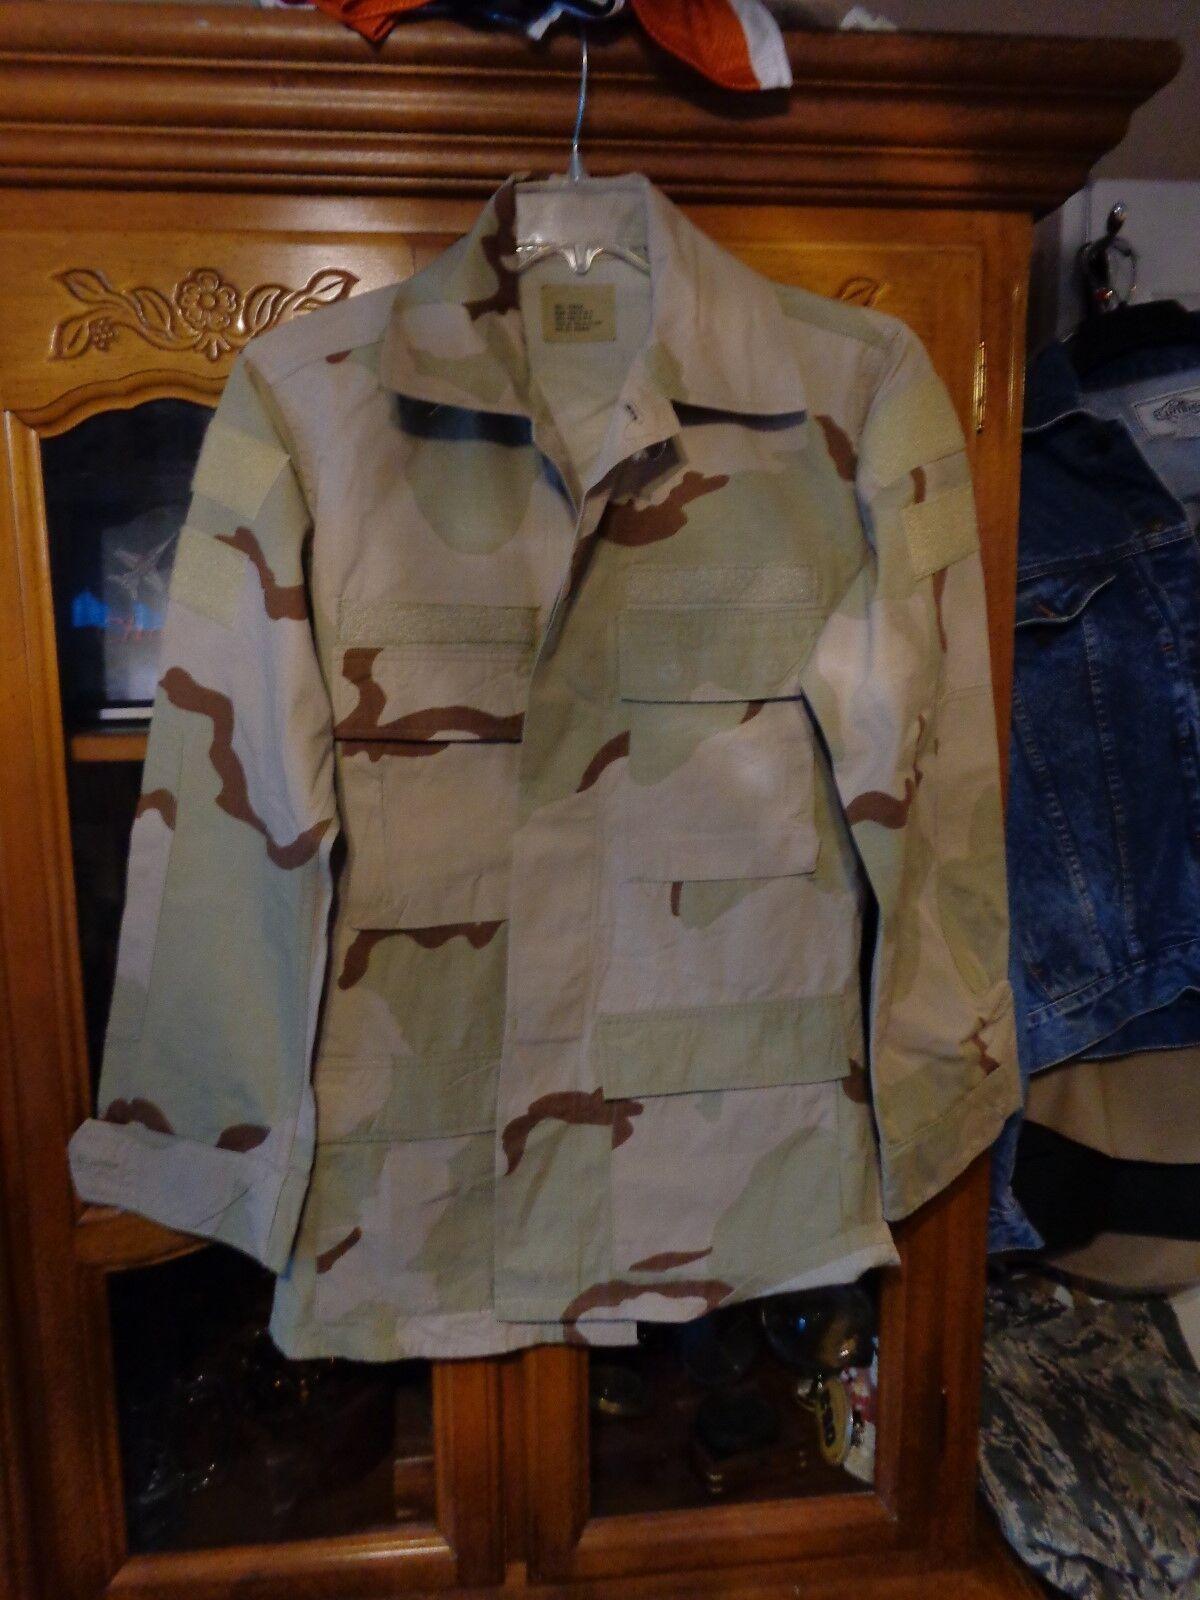 RAID MODIFIED MARSOC  Shirt BDU SMALL REG HOOK DESERT TAN USGI SUMMER WEIGHT S  shop makes buying and selling